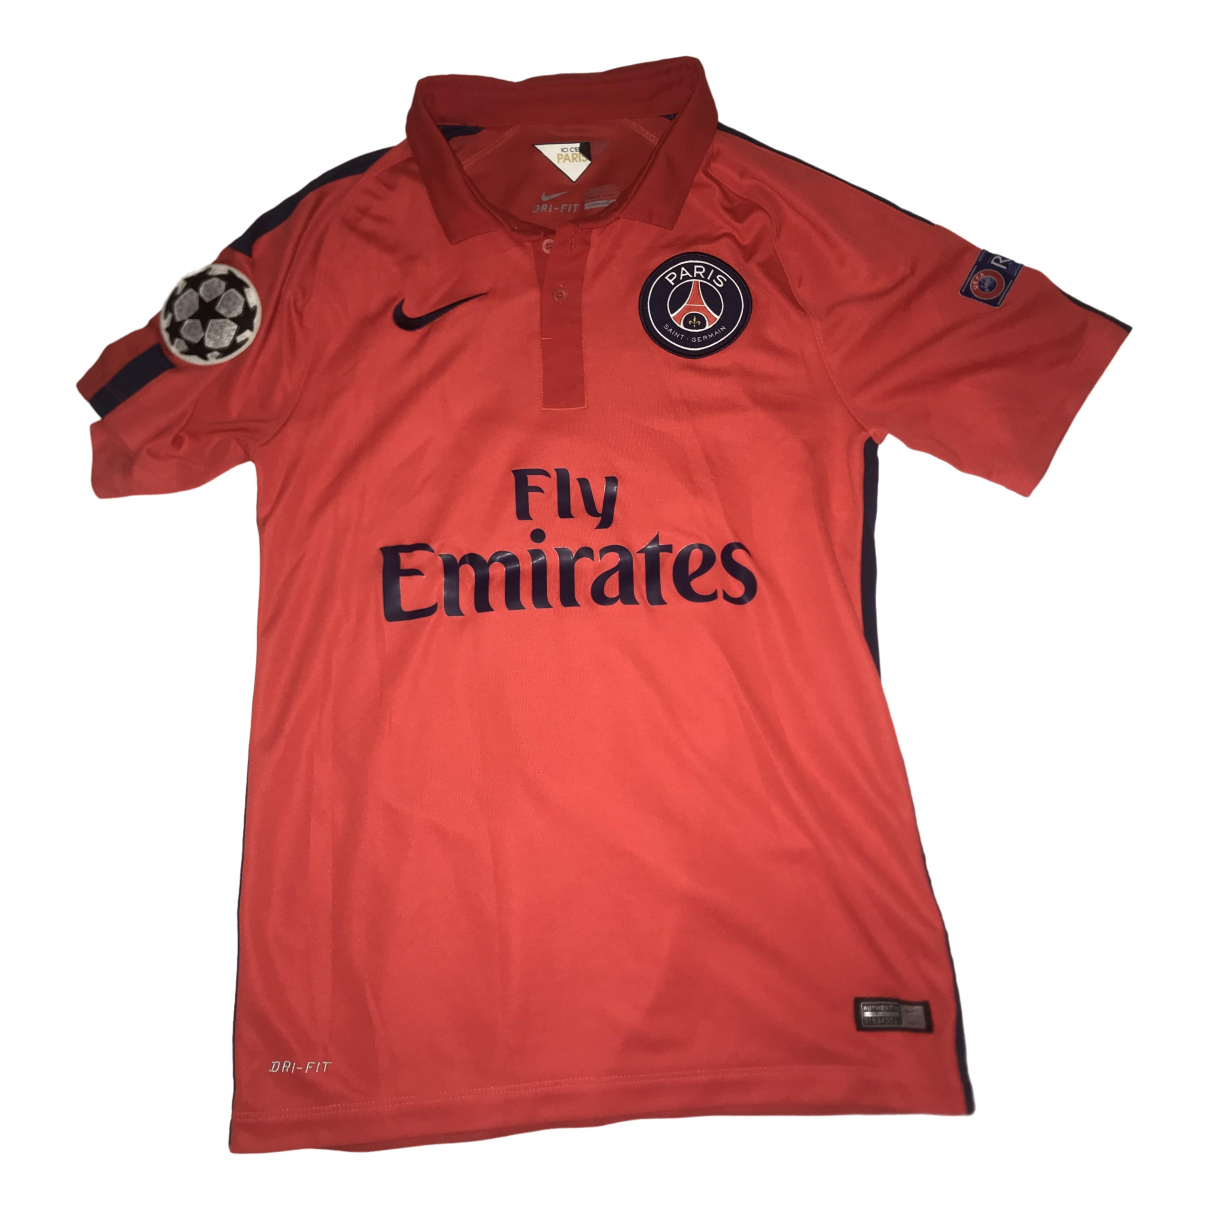 Nike \N Red T-shirts for Men S International